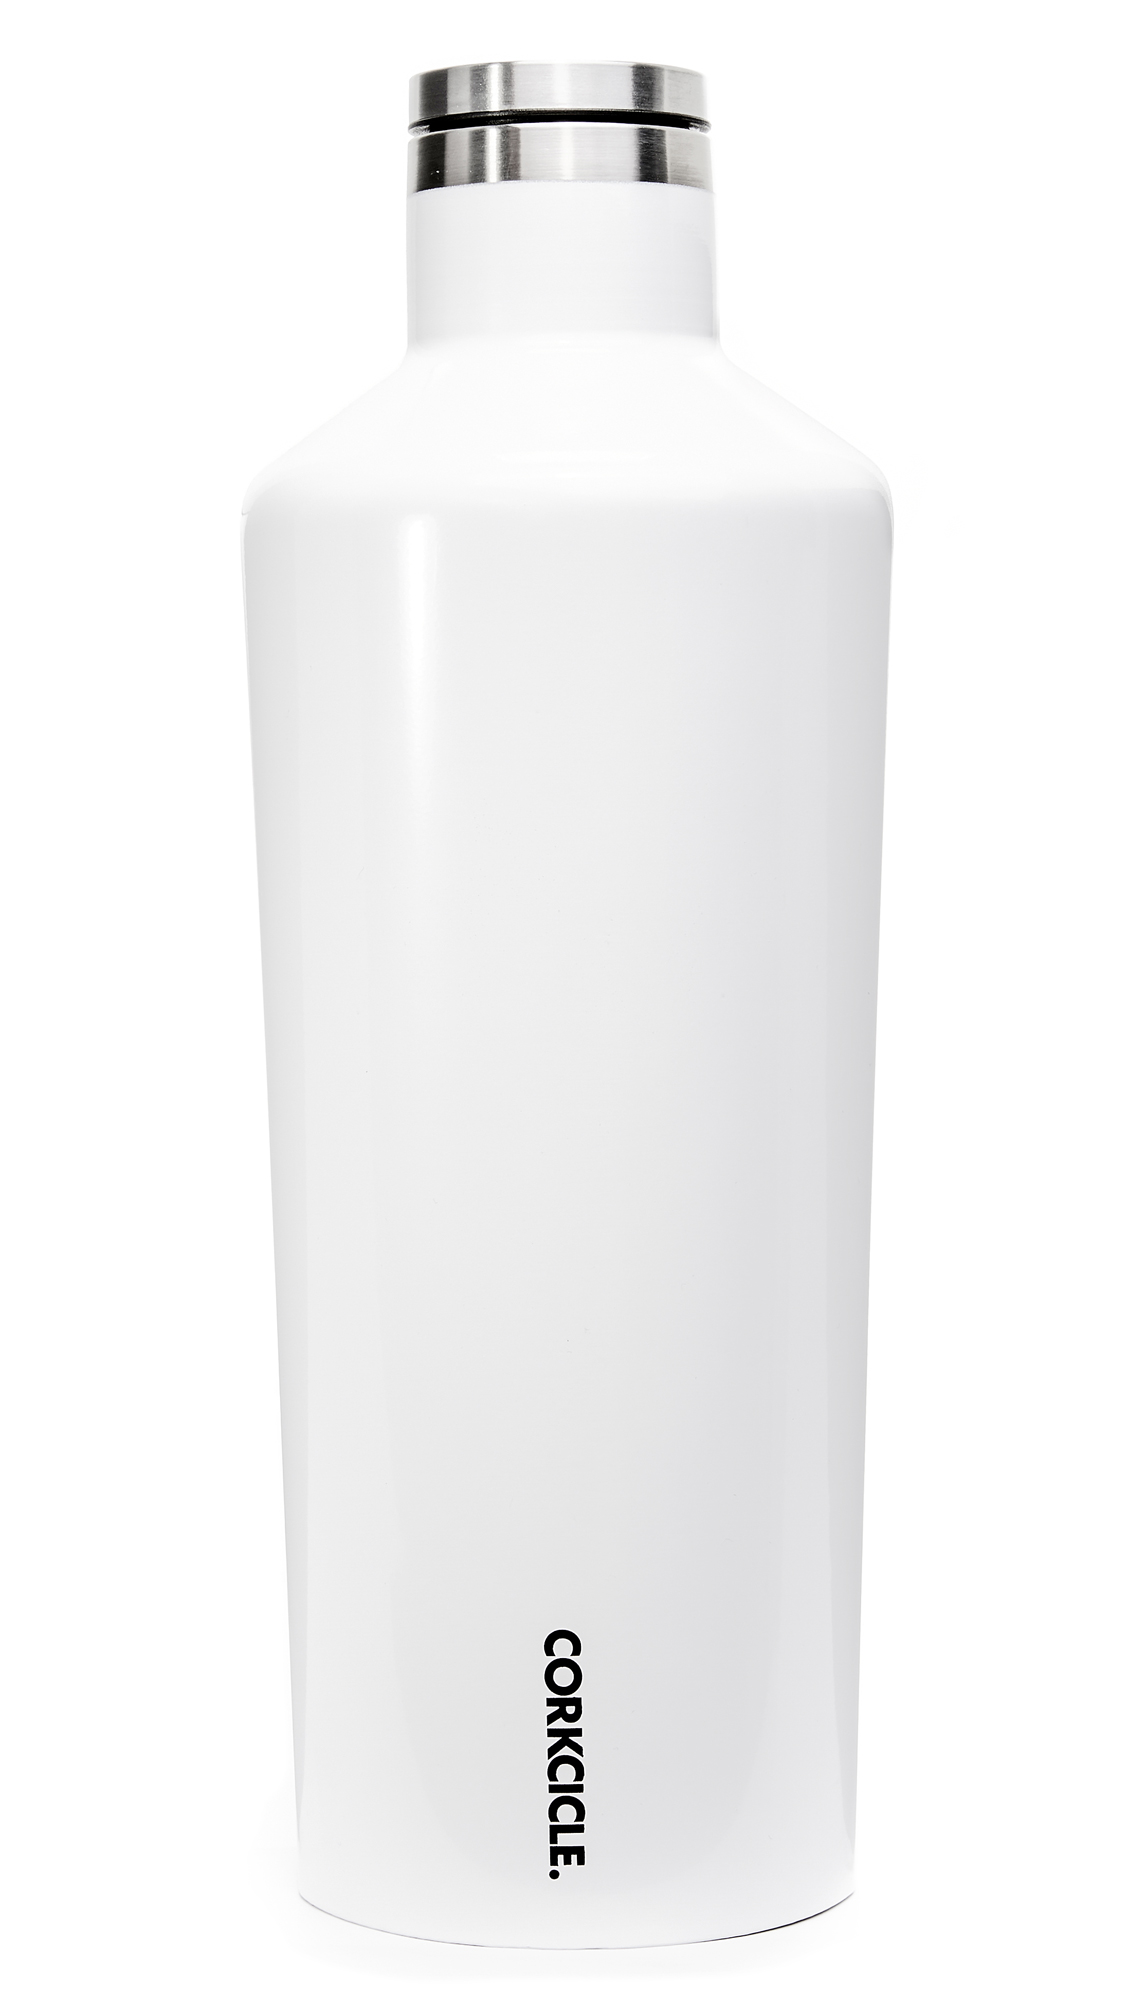 Corkcicle Gloss 60oz Canteen - Gloss White